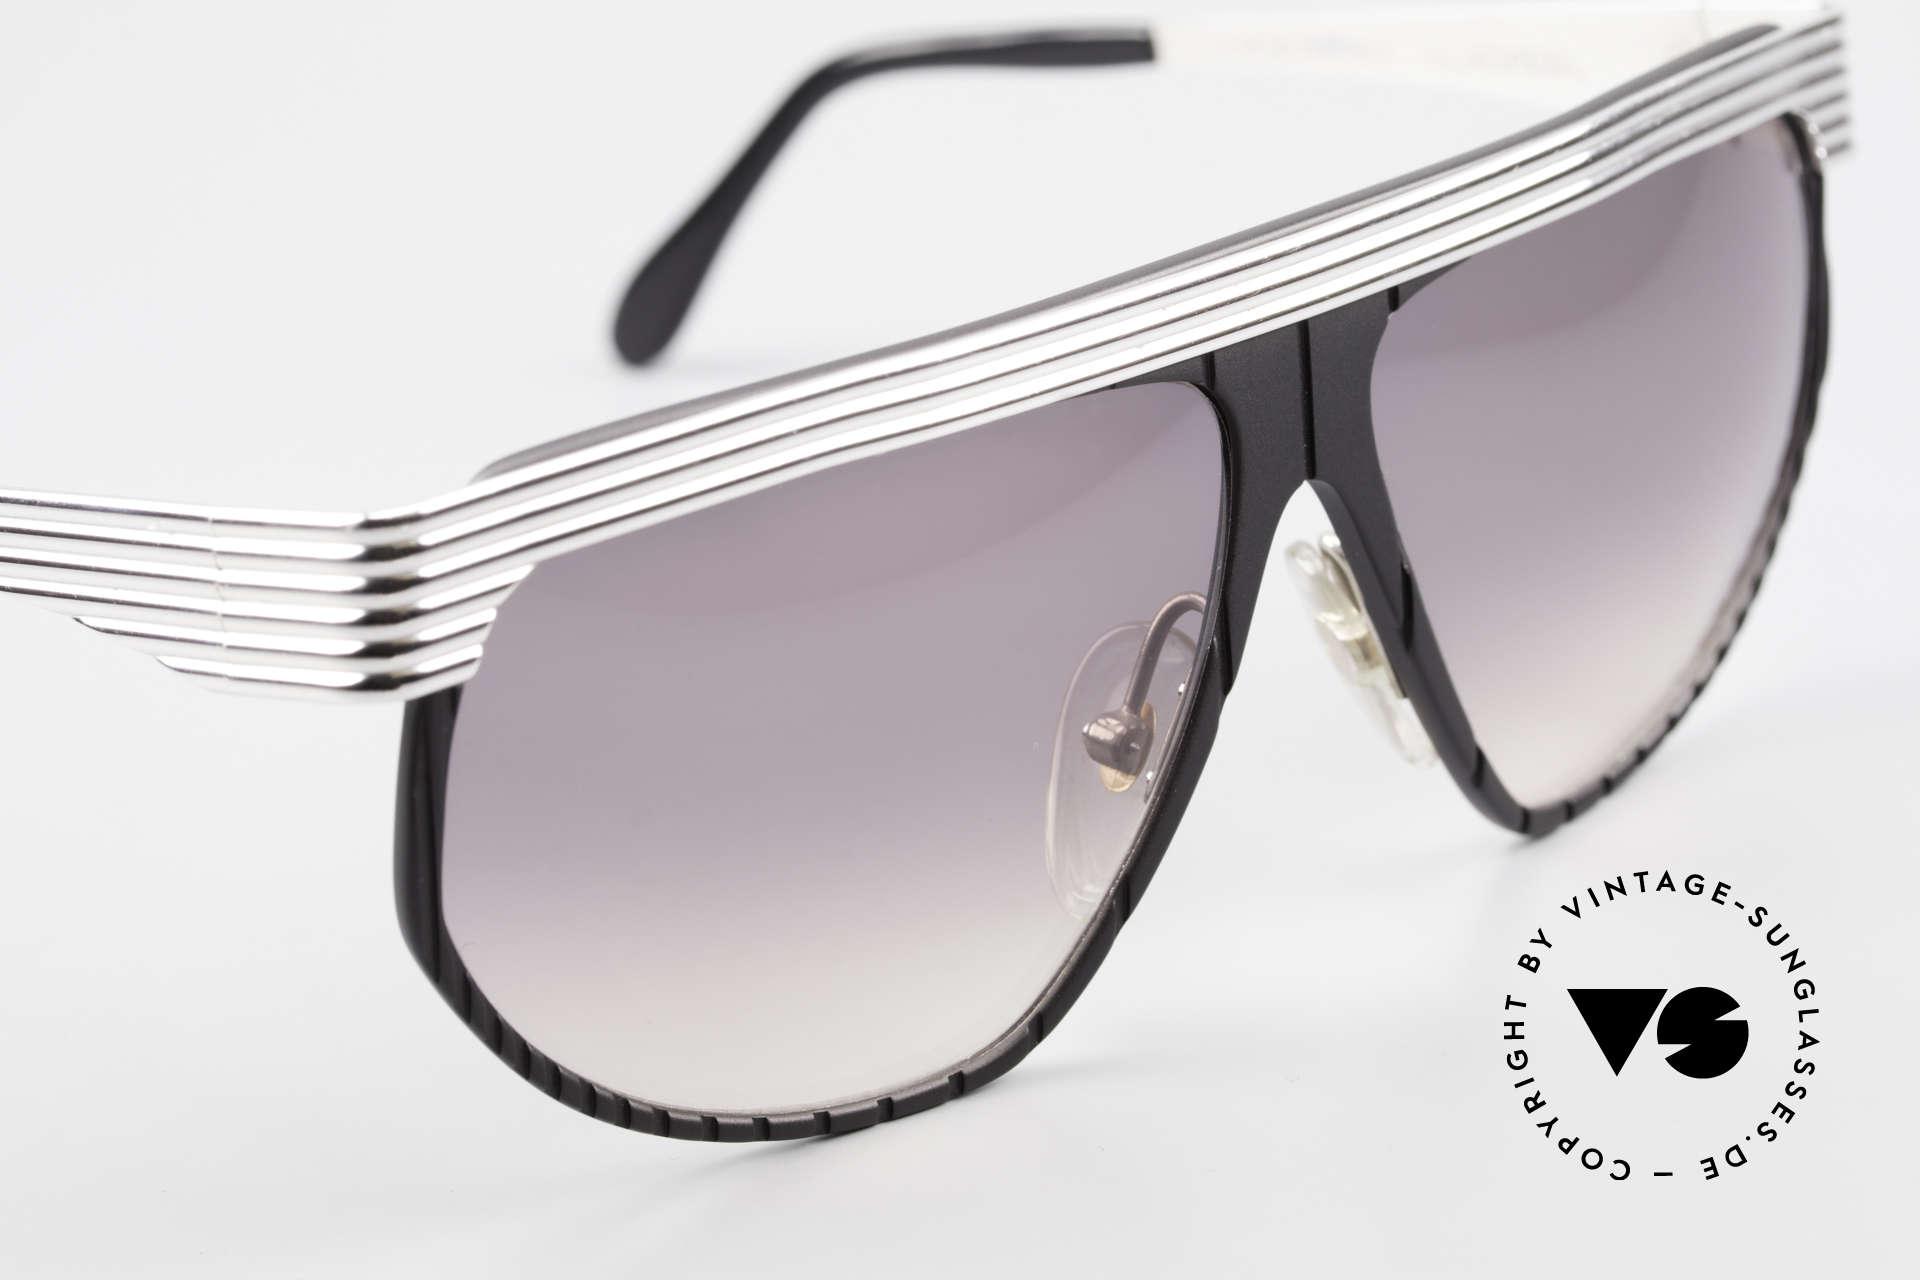 Alpina G86 No Retro Shades True 1980's, unworn (like all our rare vintage ALPINA sunglasses), Made for Men and Women